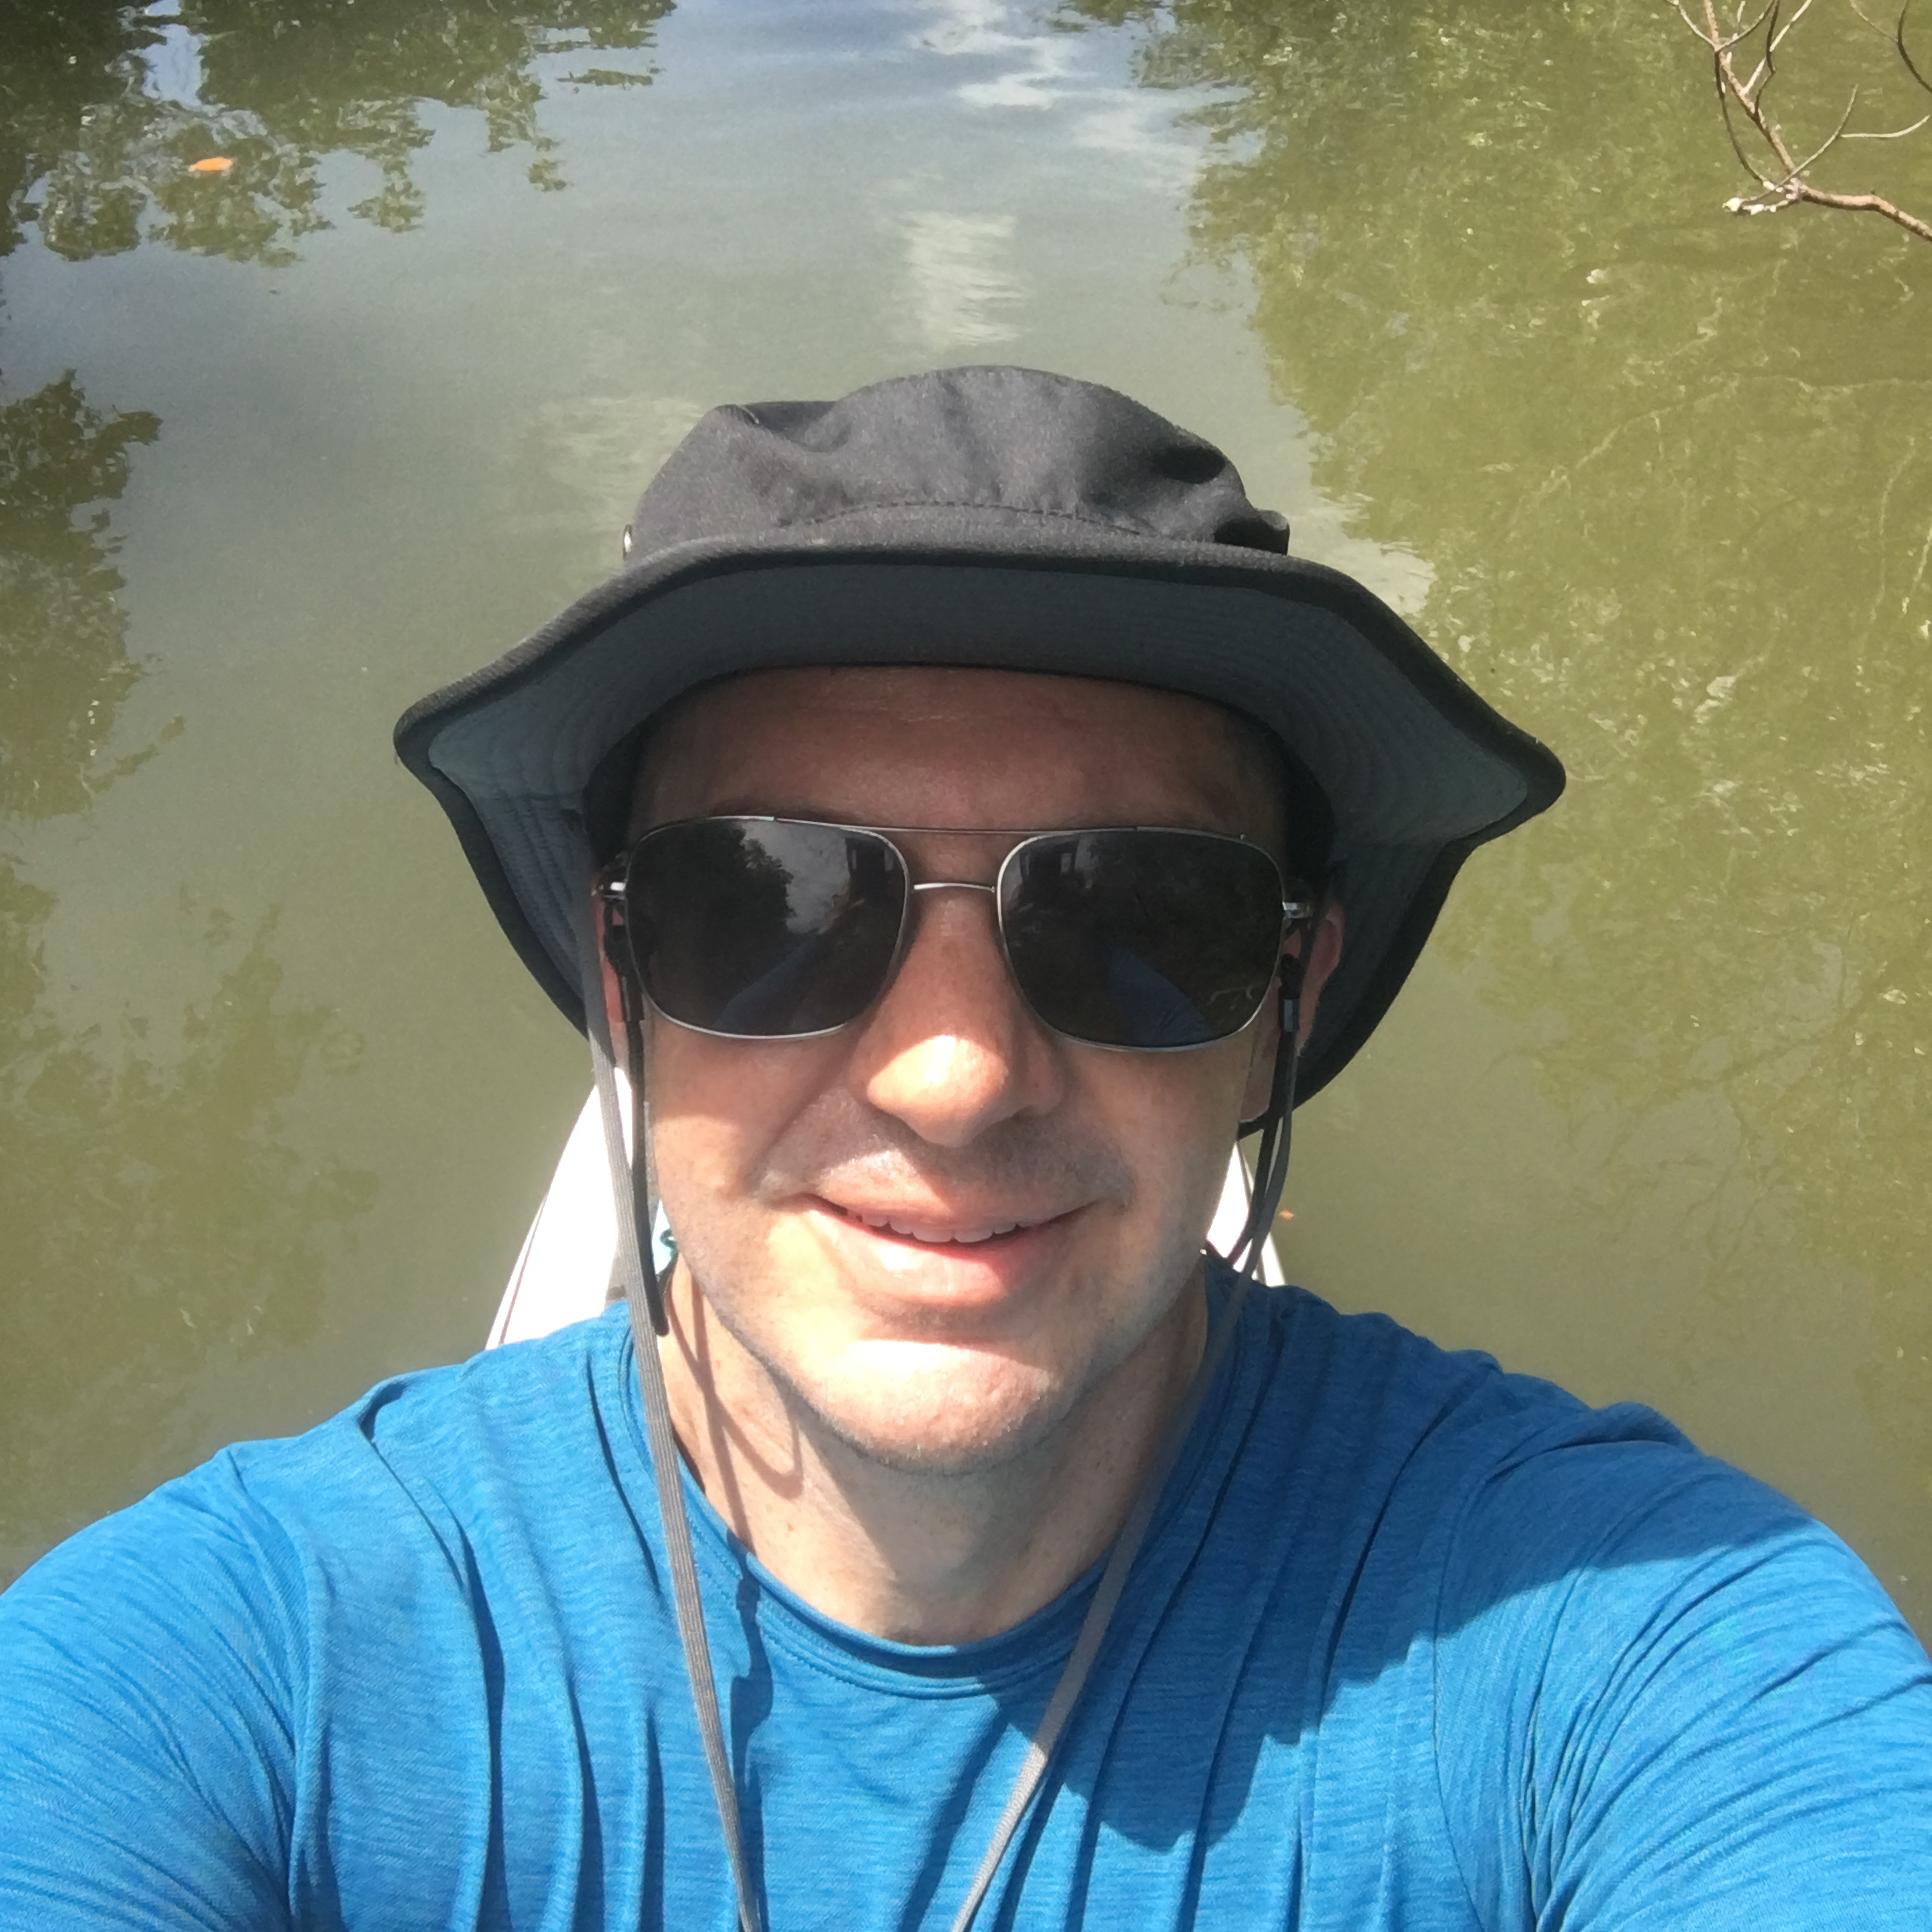 SUP Exploring Mangroves